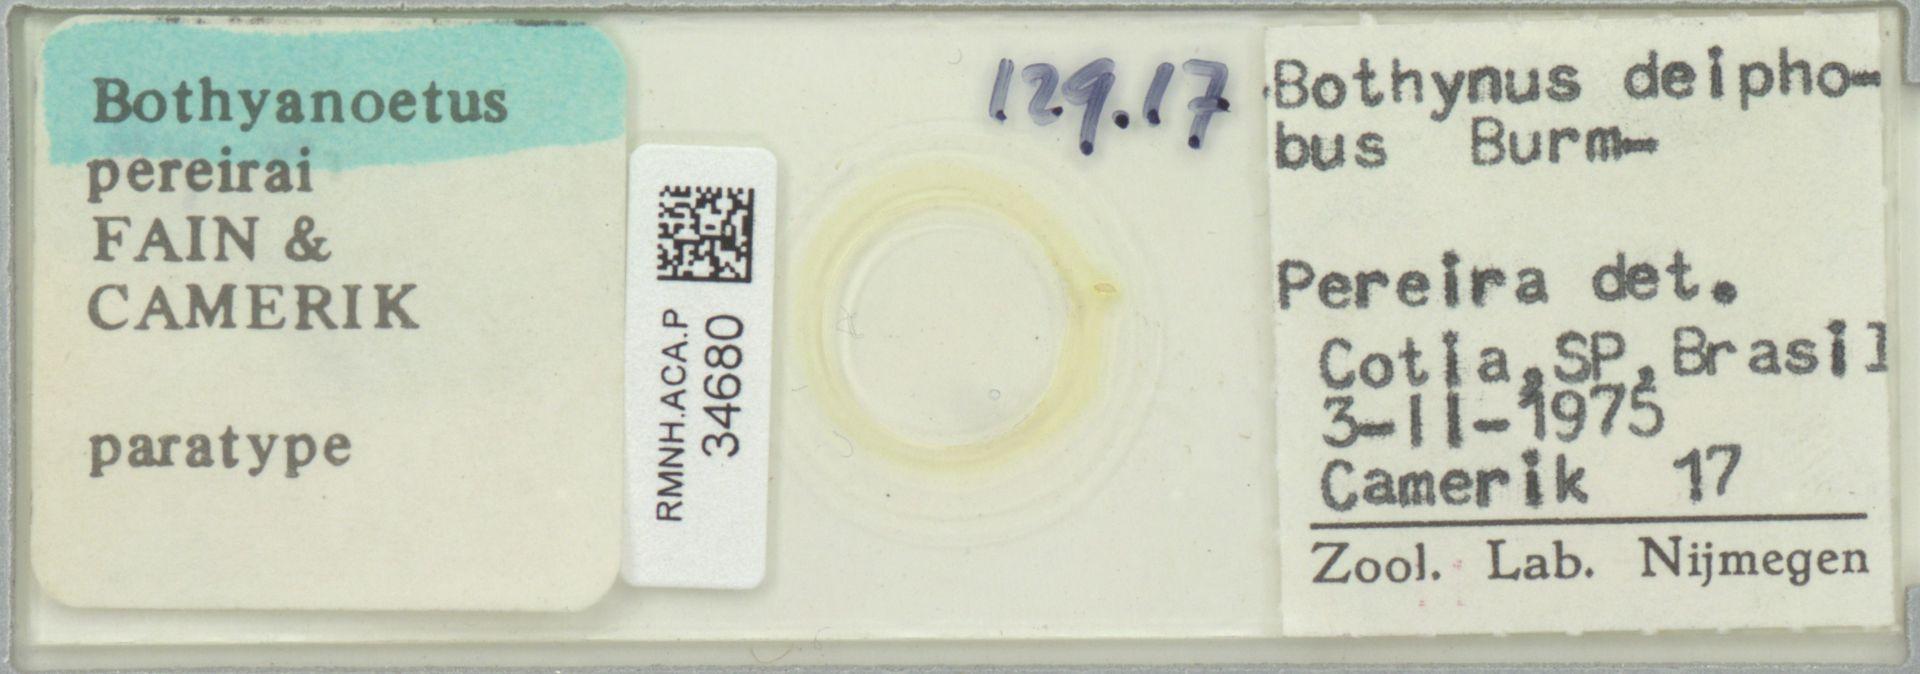 RMNH.ACA.P.34680 | Bothyanoetus pereirai Fain & Camerik